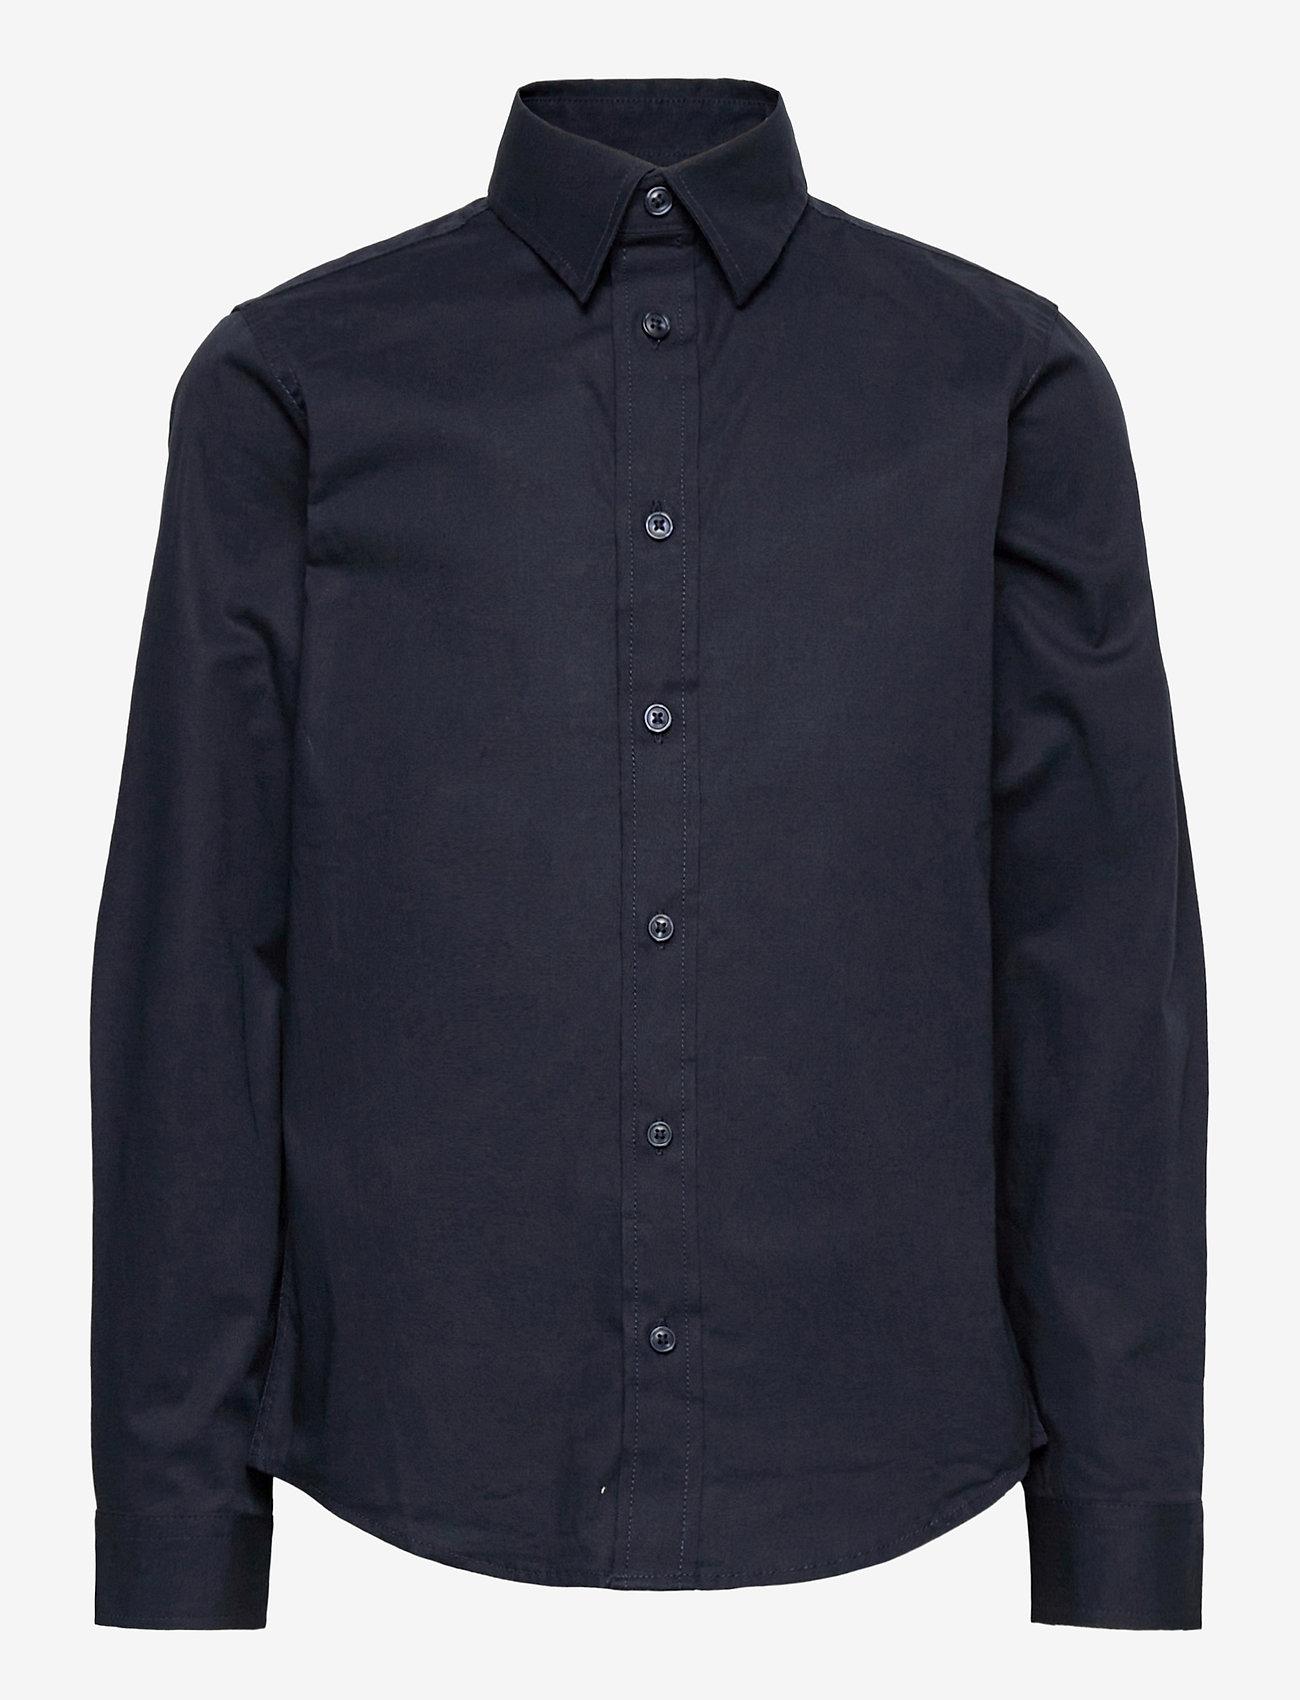 Jack & Jones - JJEMASON STRETCH SHIRT L/S ES21 JR - shirts - navy blazer - 0